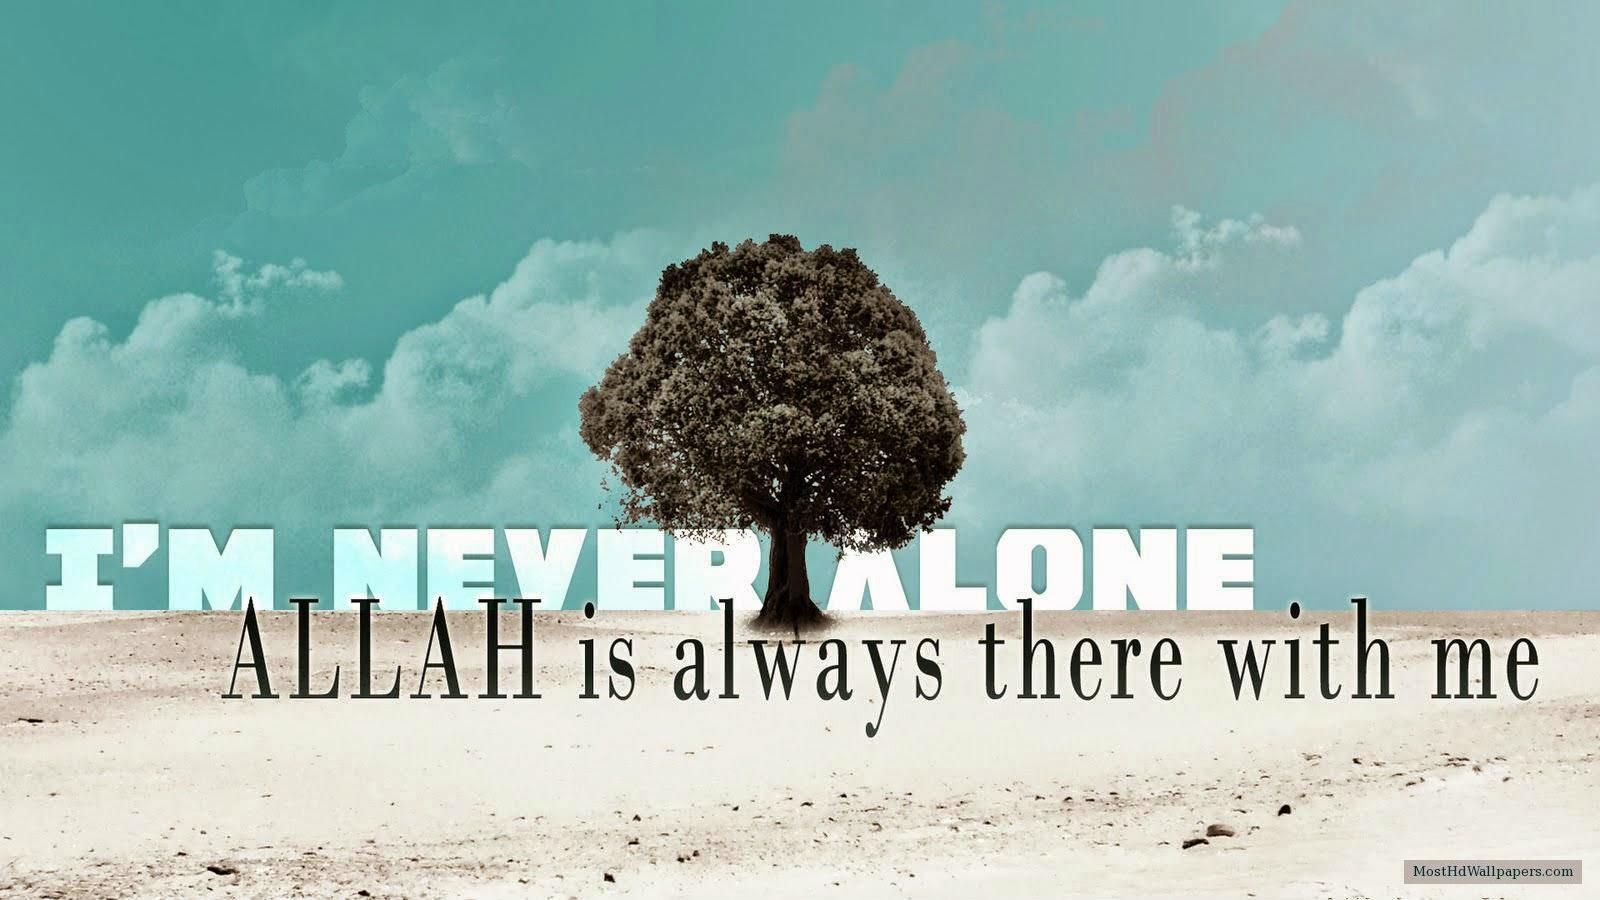 Popular Reminder Ramadan Wallpaper - Most-Beautiful-HD-Islamic-Quotes-Images  Photograph_415677 .jpg